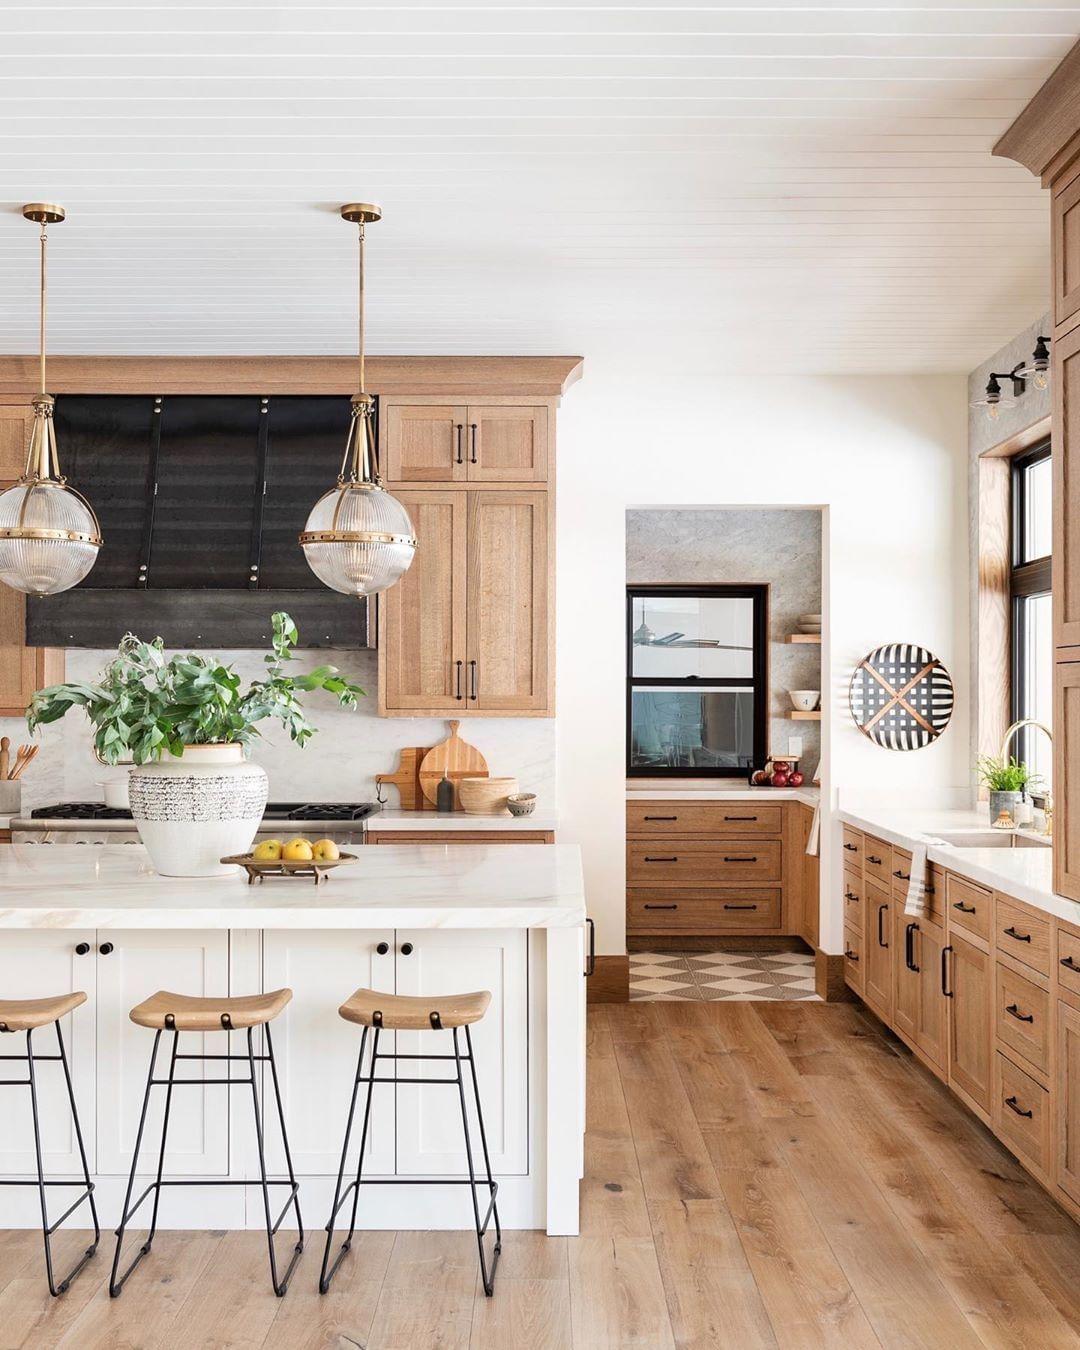 Westwing Maison Decoration On Instagram Spacieuse Et Epuree On Adore Cette Cuisine Tendance Et In 2020 Latest Kitchen Designs Home Decor Kitchen Kitchen Design